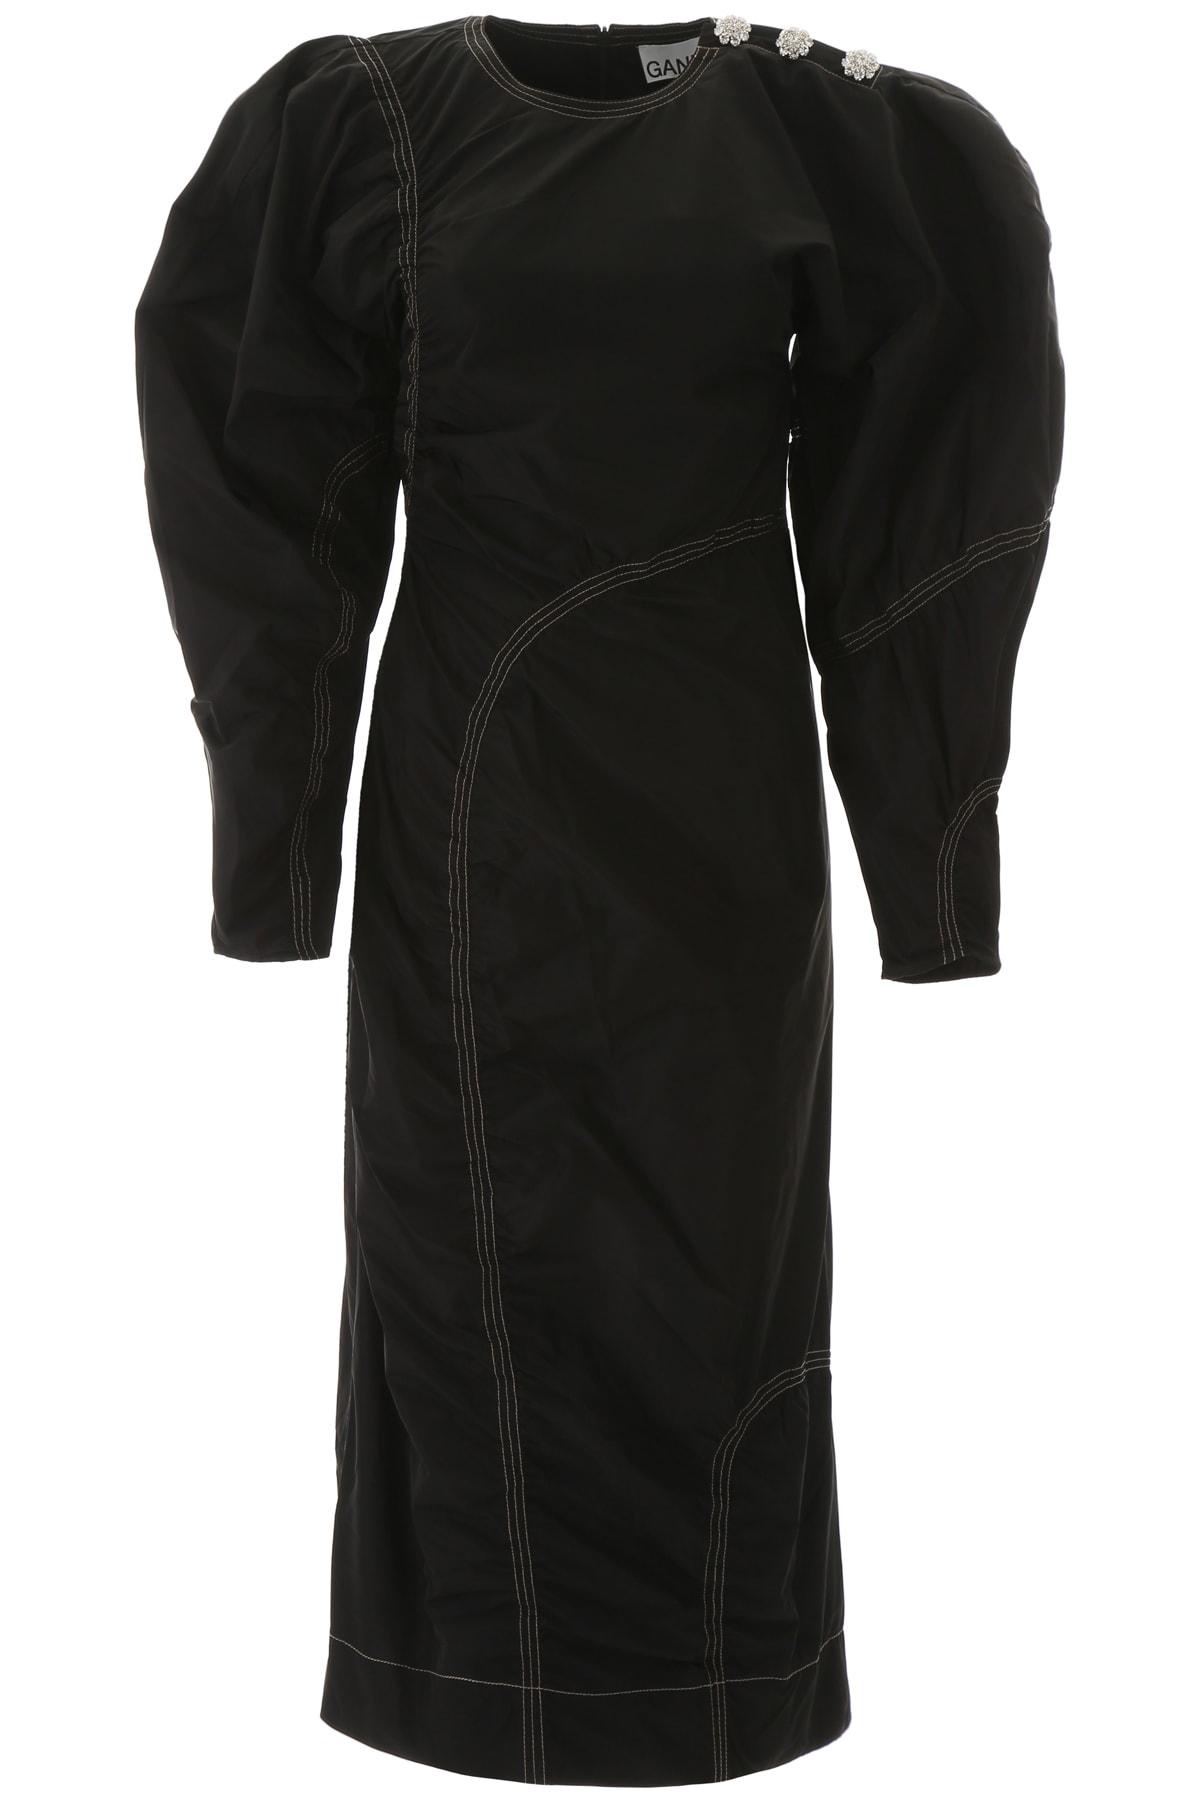 Ganni Eco Circle Dress